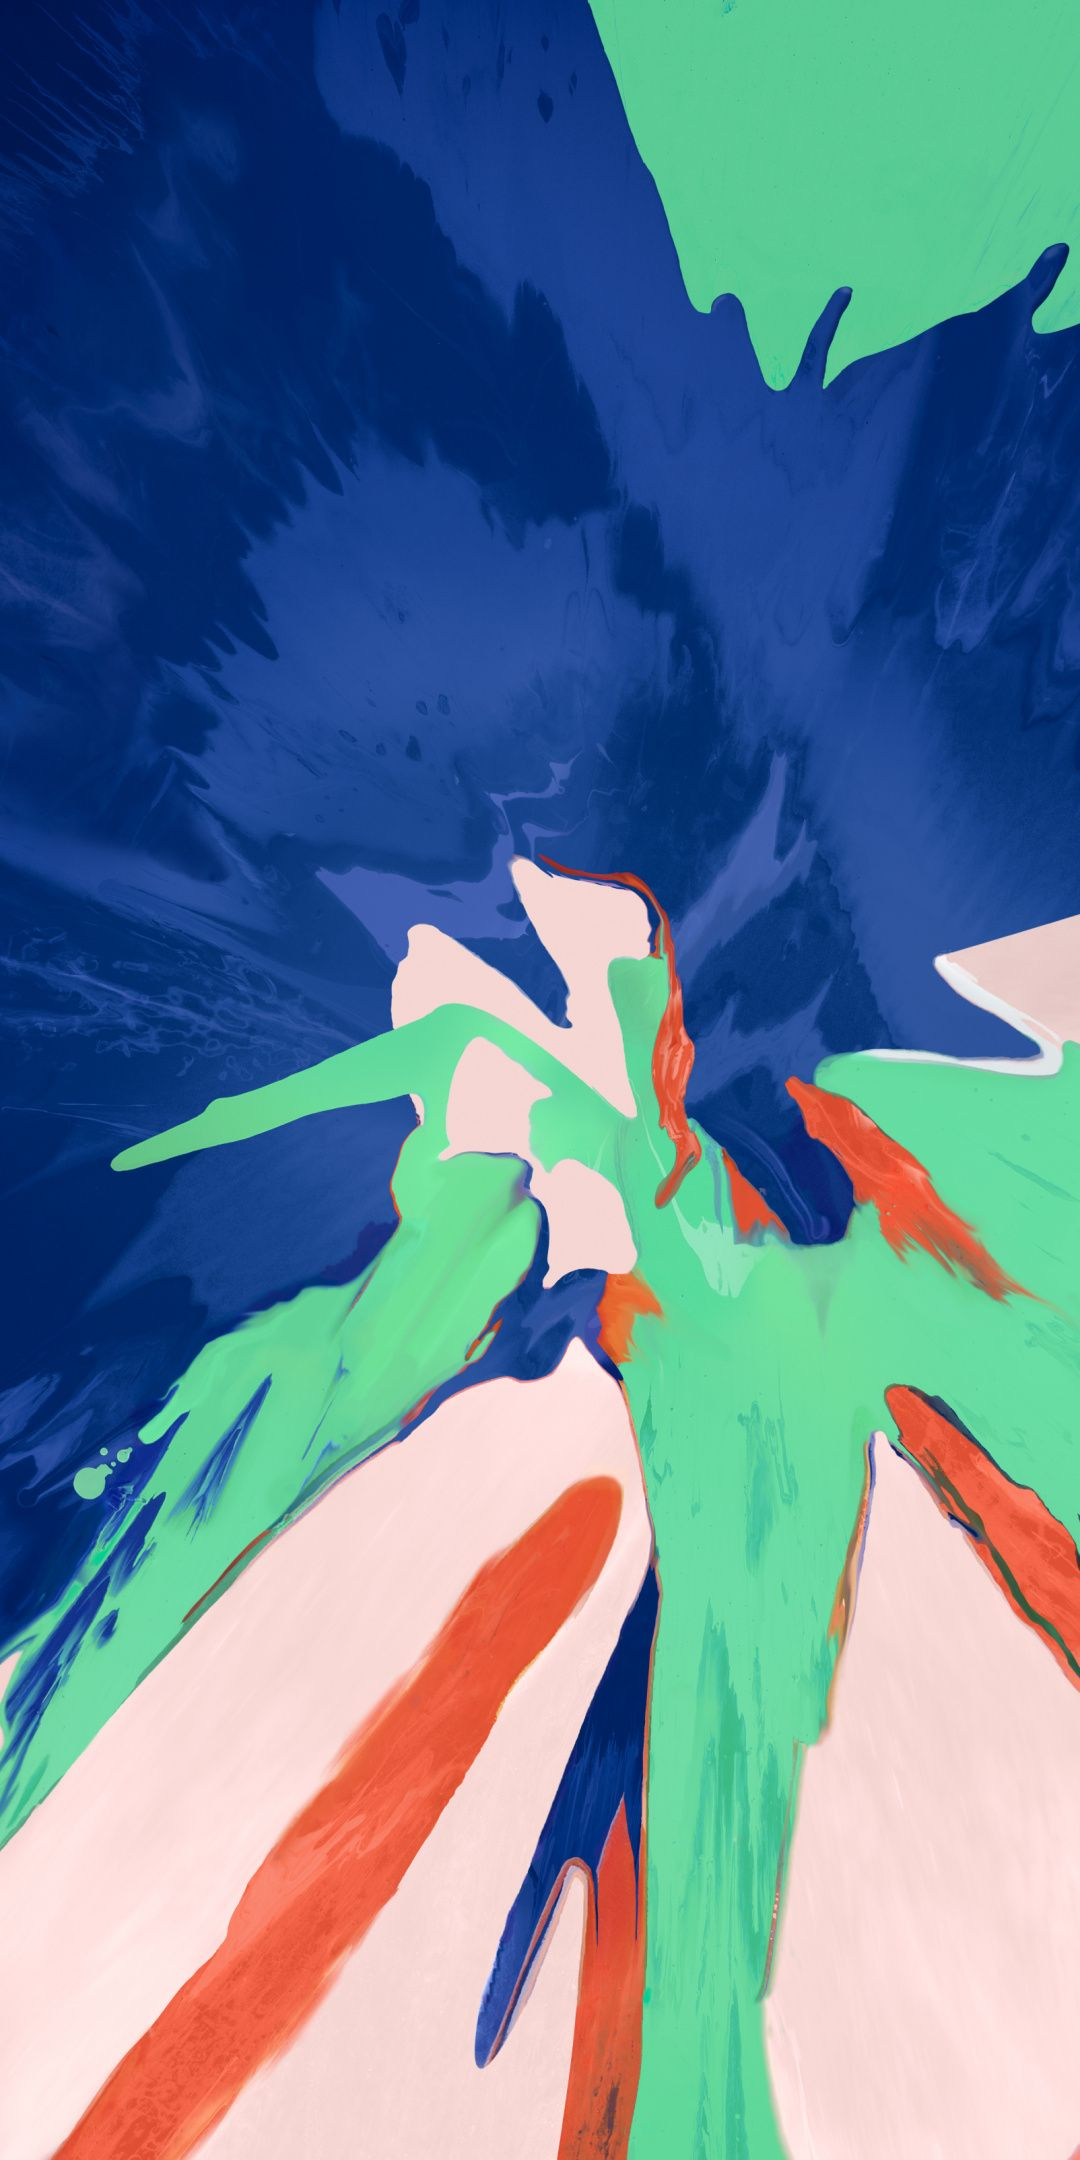 Splash, abstract, texture, paint, colorful, 1080x2160 wallpaper | Wallpaper in 2019 | Fondos de ...